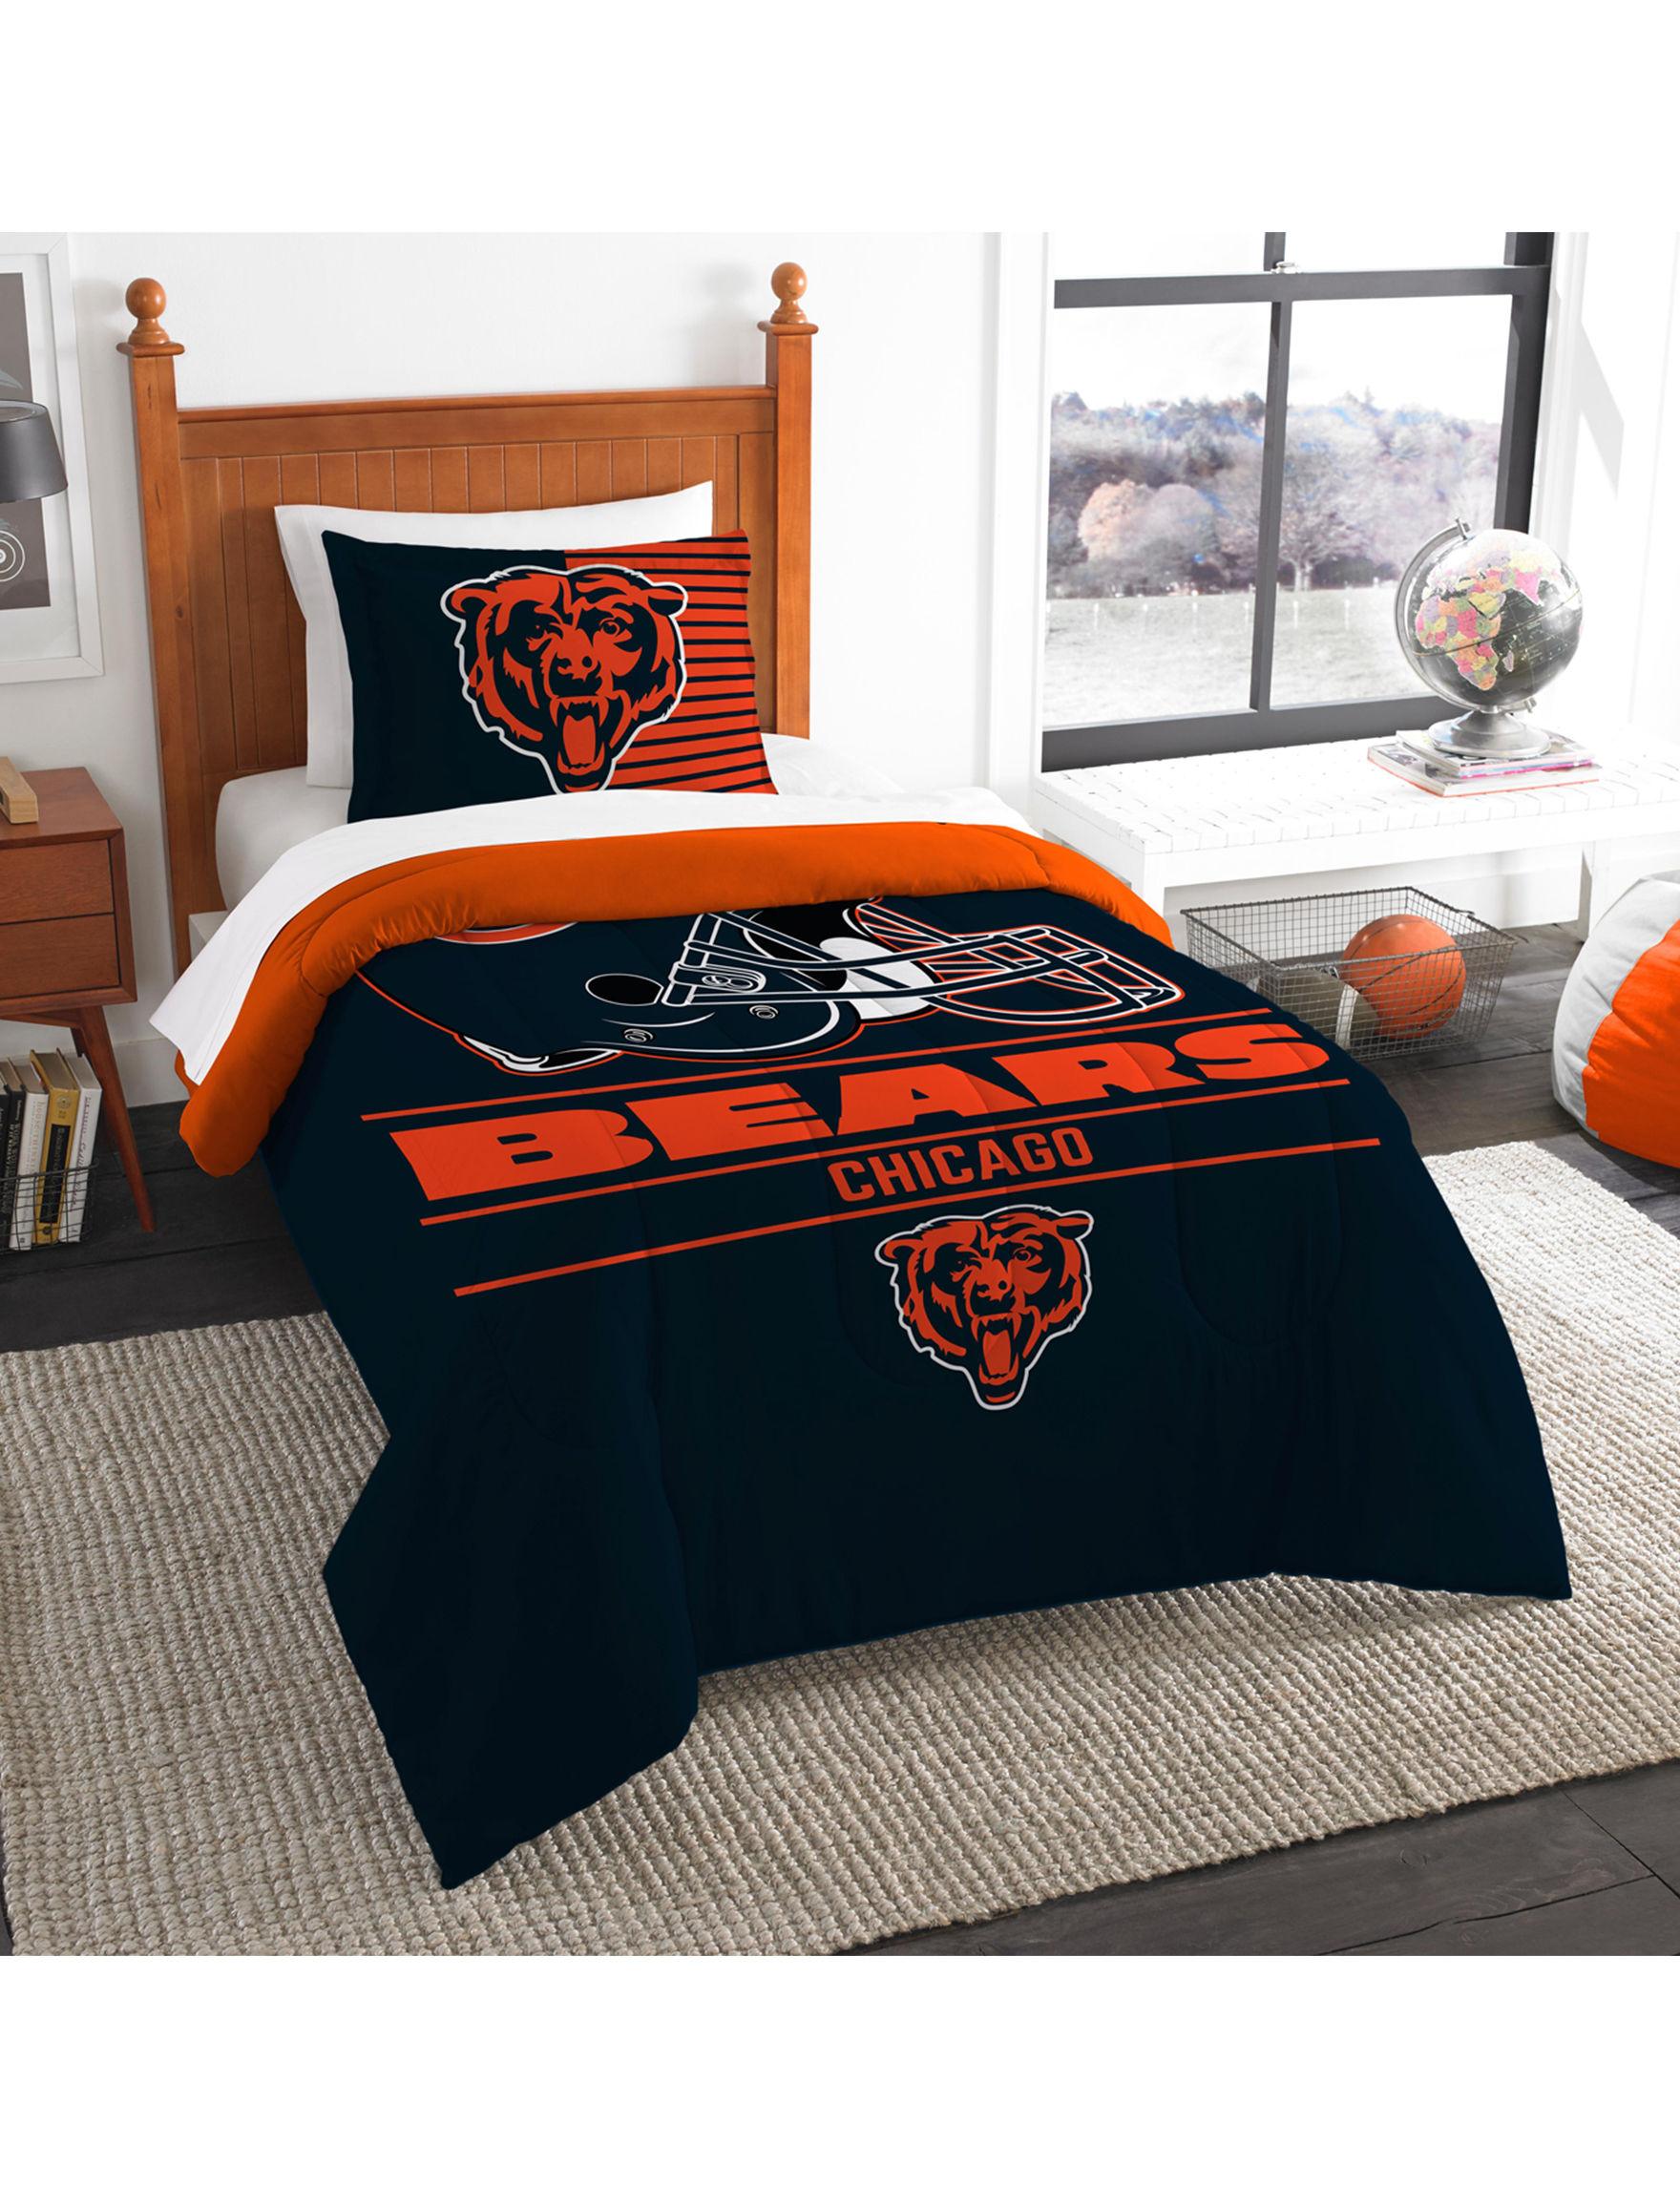 The Northwest Company Orange / Black Comforters & Comforter Sets